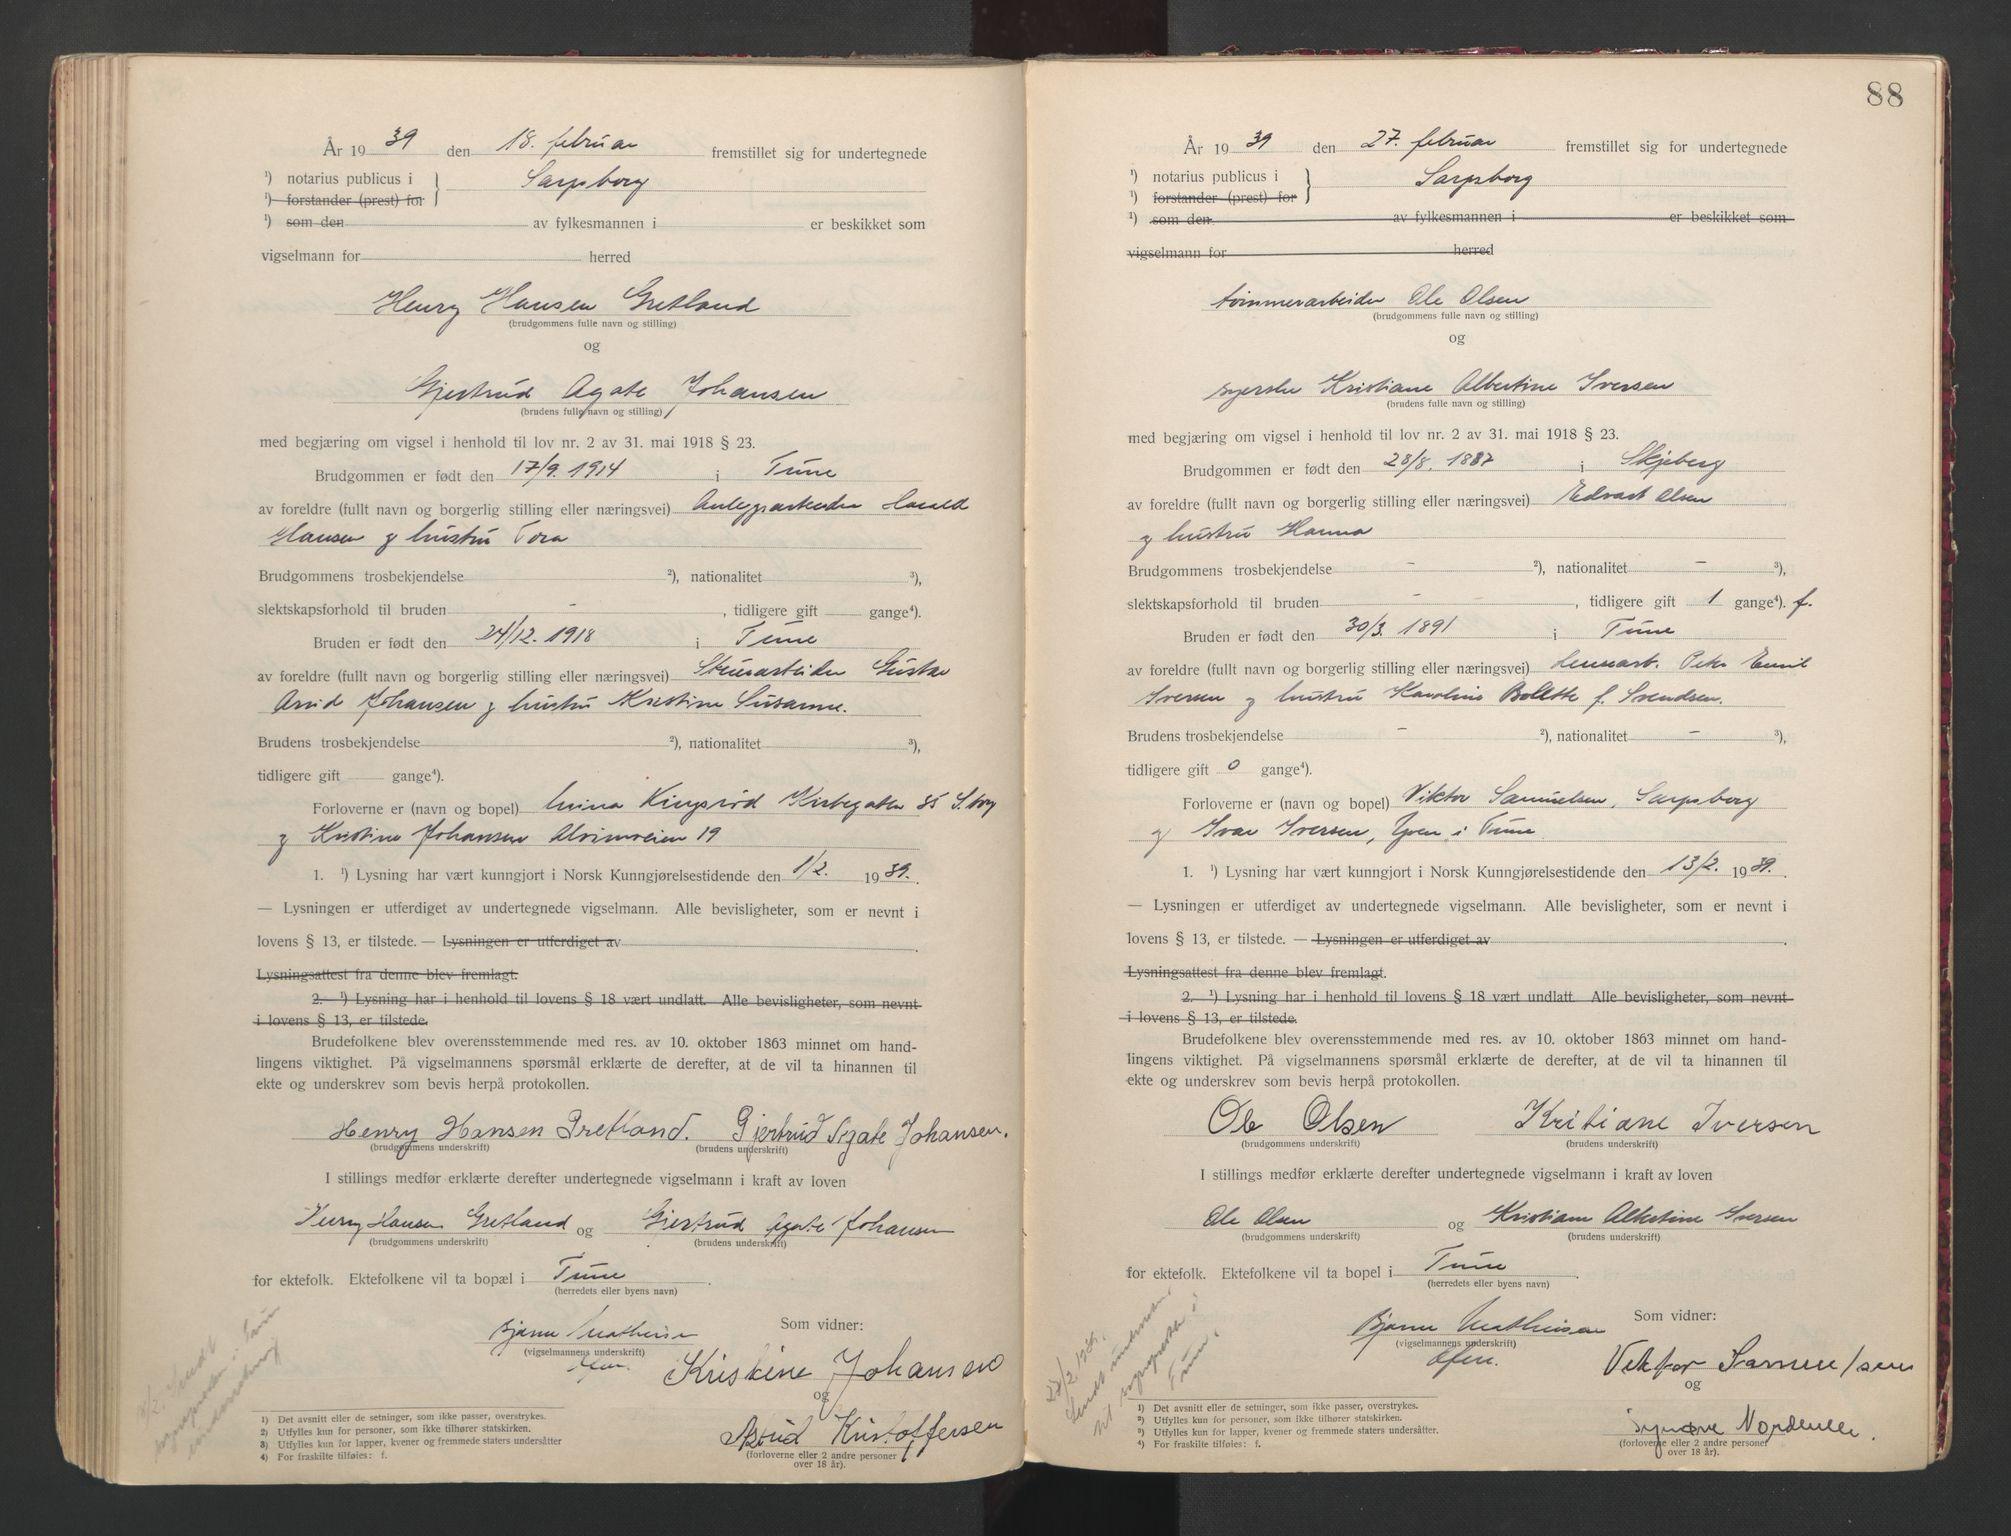 SAO, Sarpsborg byfogd, L/Lb/Lba/L0001: Vigselbok, 1920-1941, s. 88